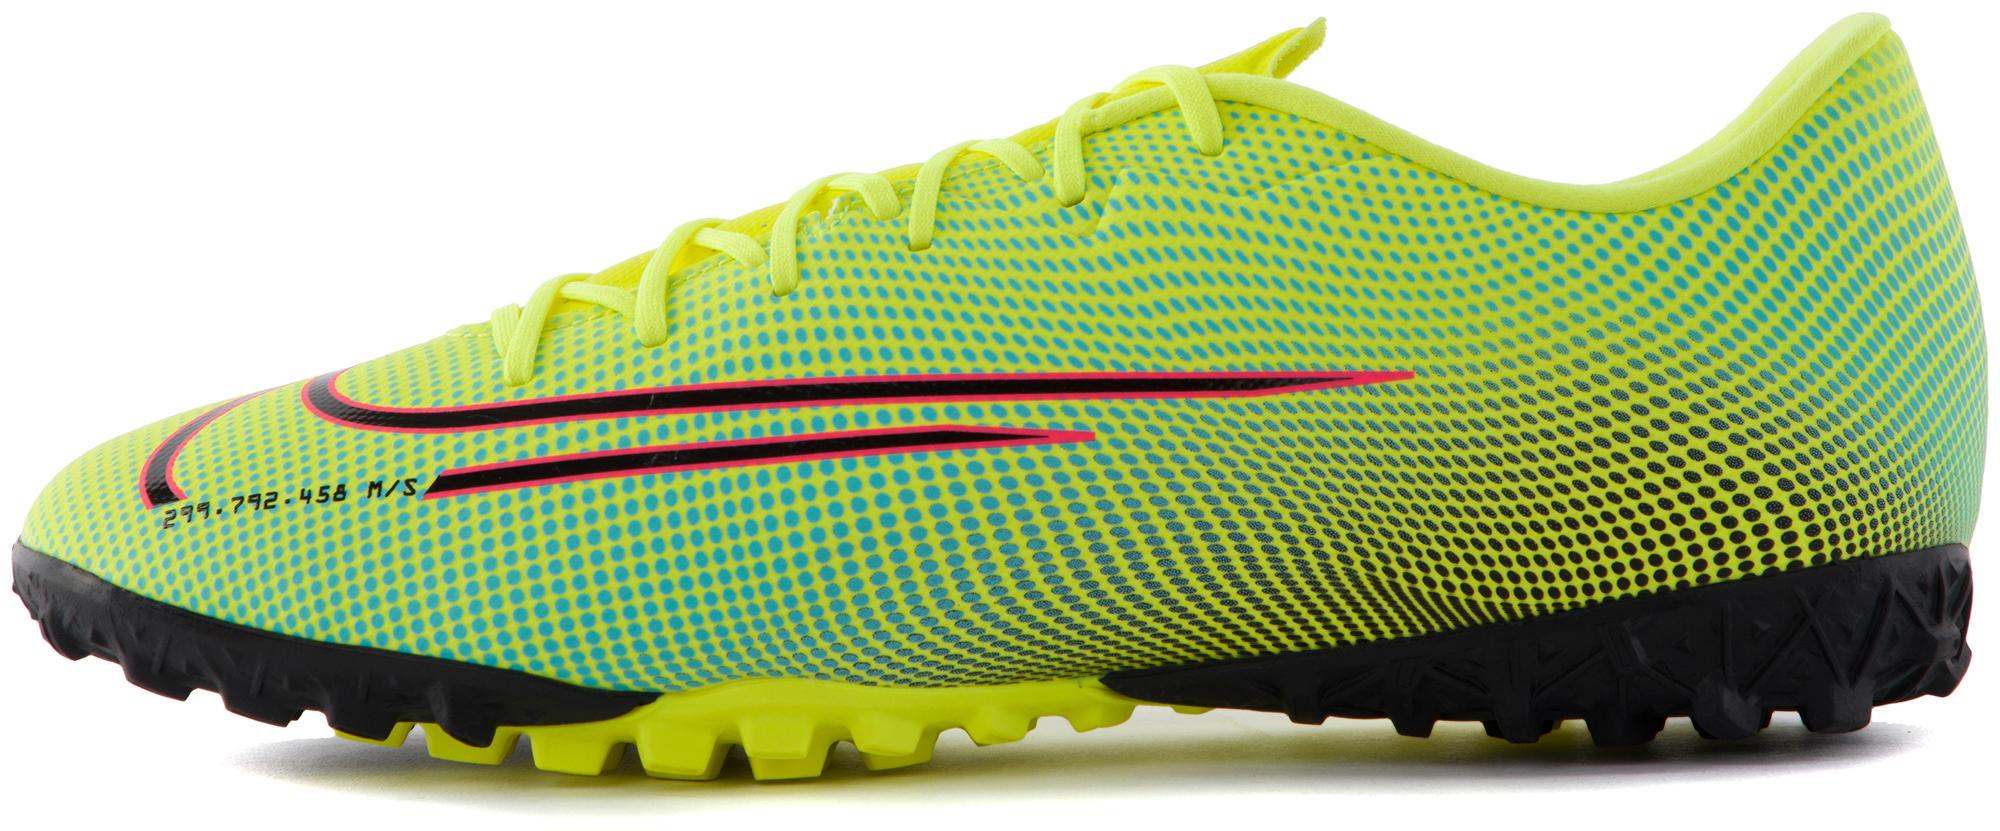 Nike Бутсы мужские Nike Vapor 13 Academy MDS TF, размер 42 рюкзак nike vapor energy ba5538 011